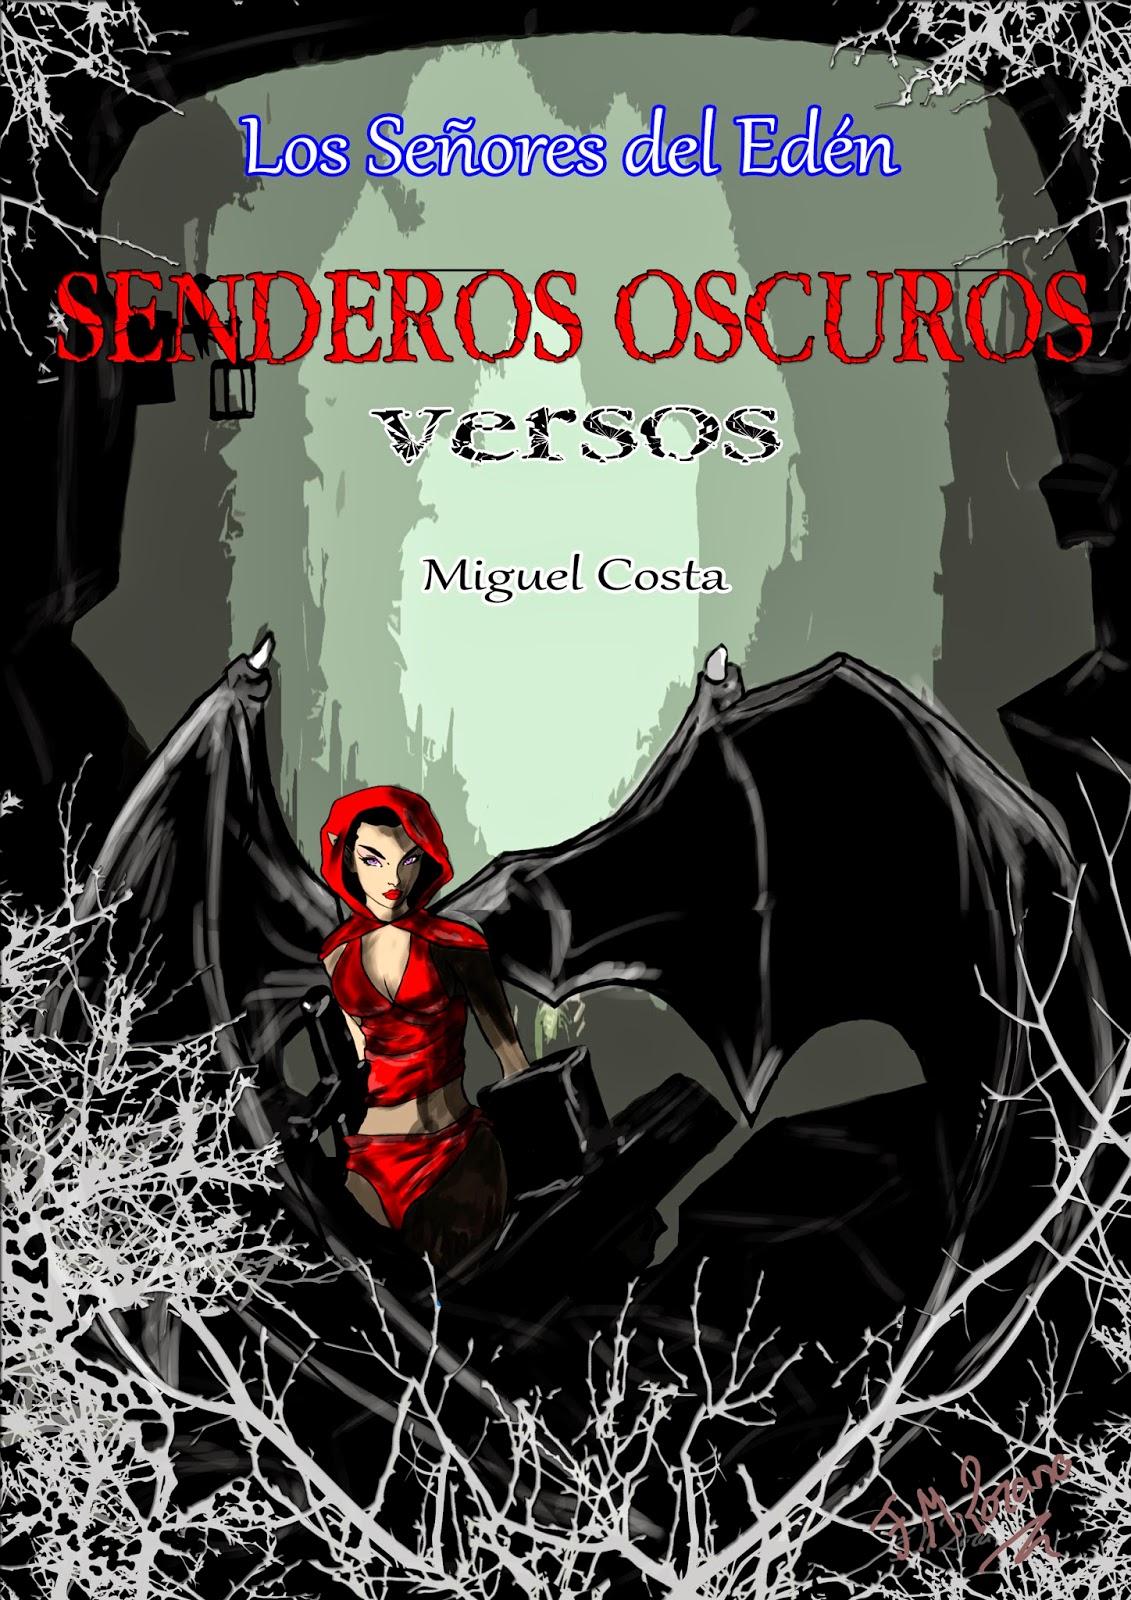 http://miguelcostatovar.blogspot.com.es/p/blog-page_10.html